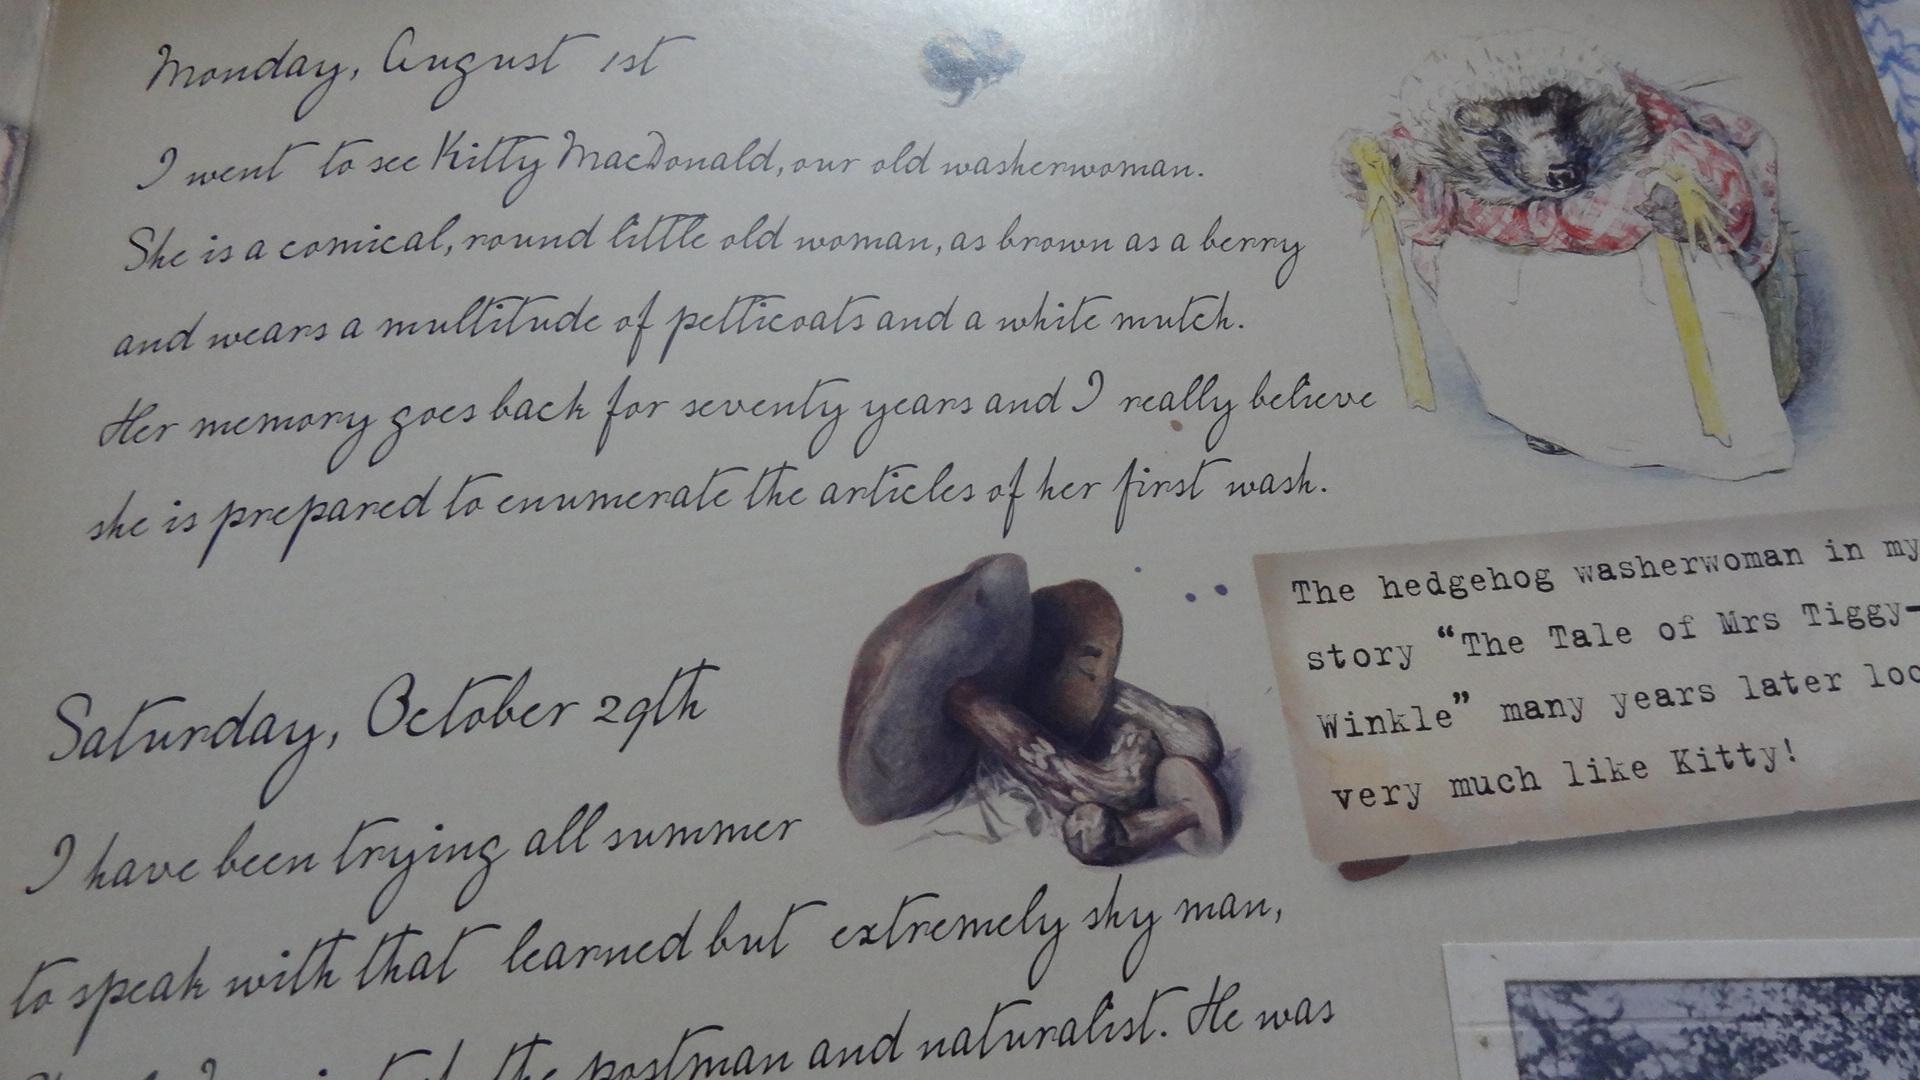 scientific greeting cards images